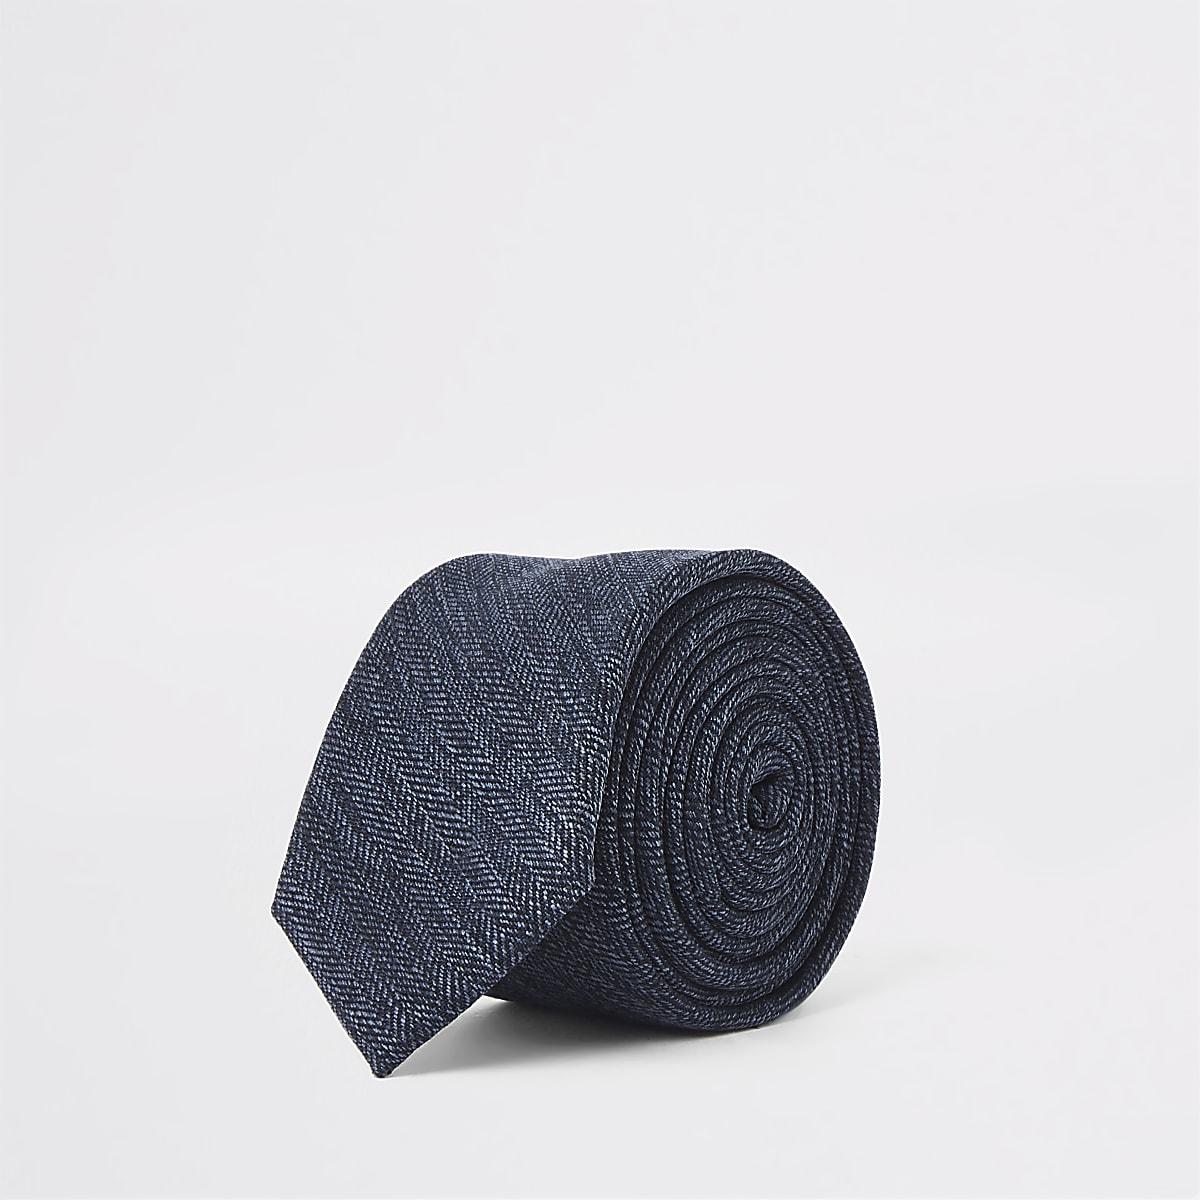 Cravate bleu marine à chevrons